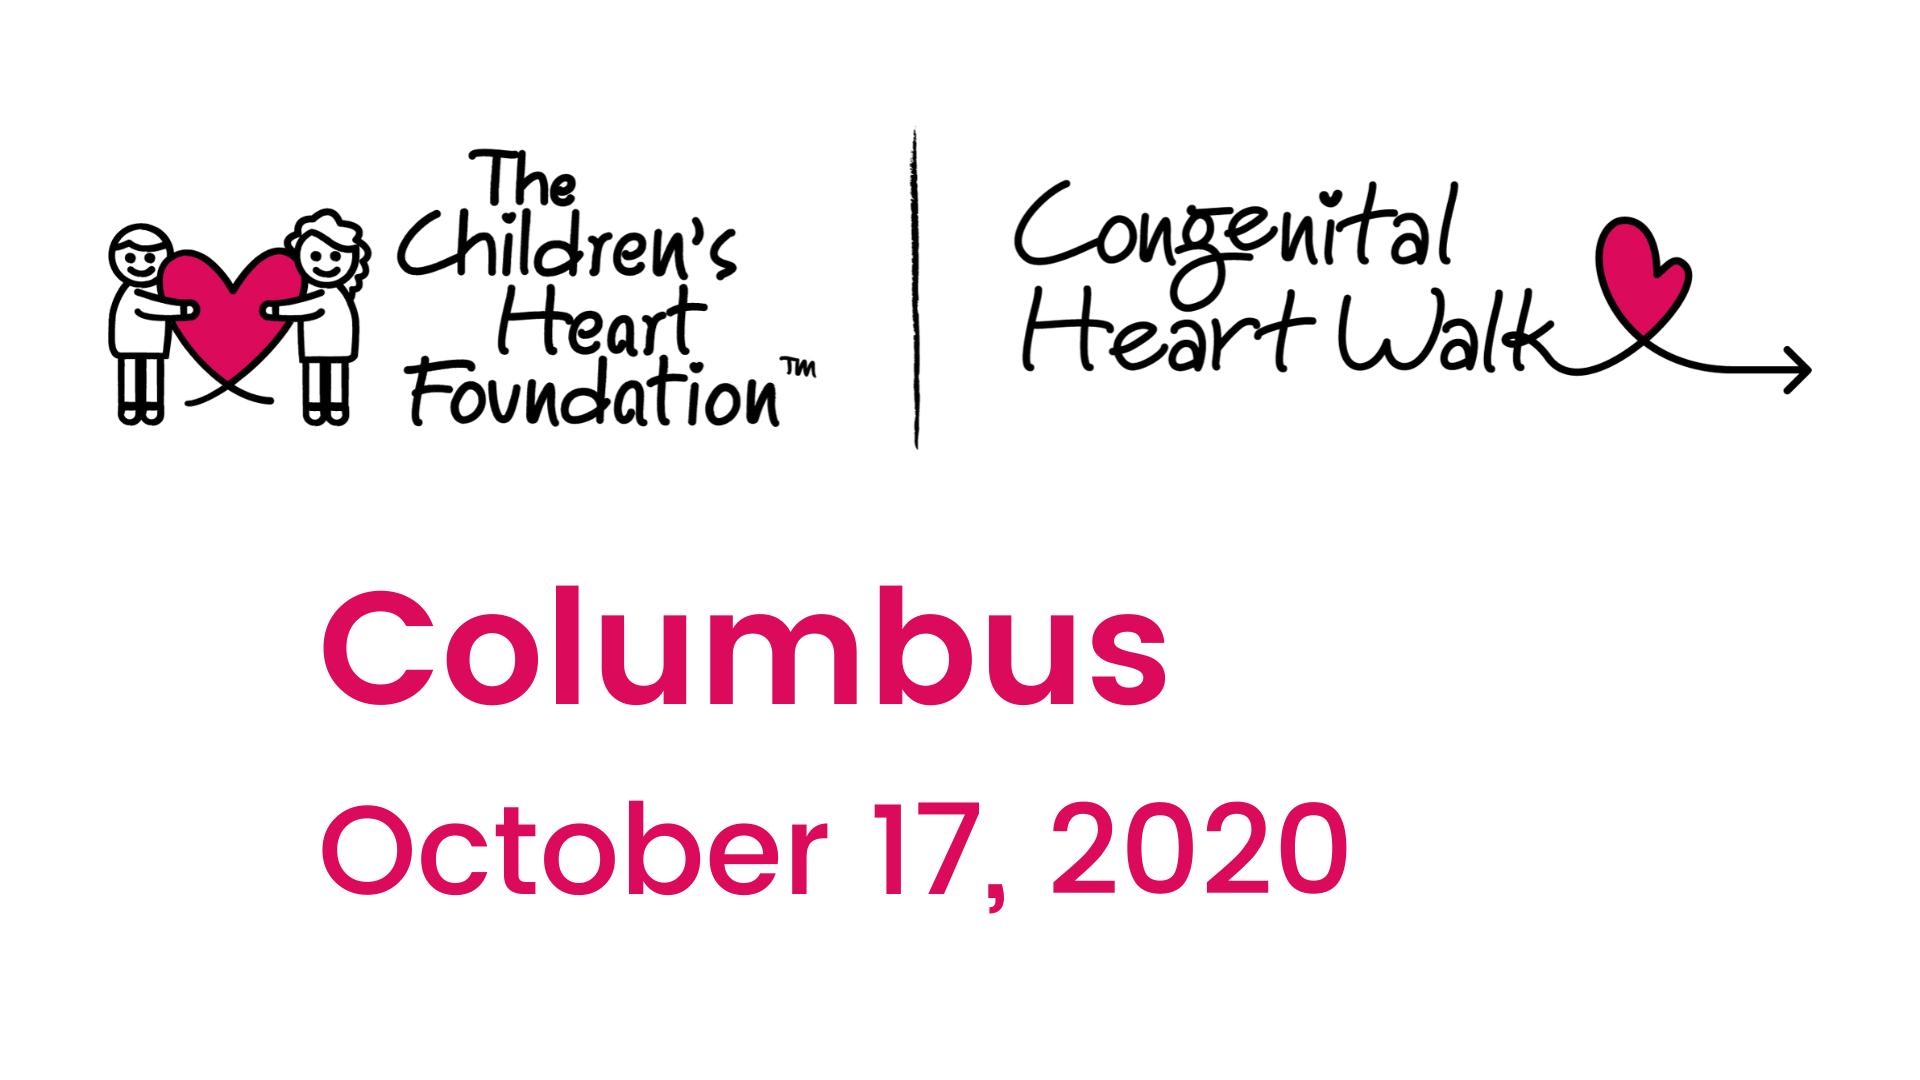 Columbus Congenital Heart Walk (Ohio)